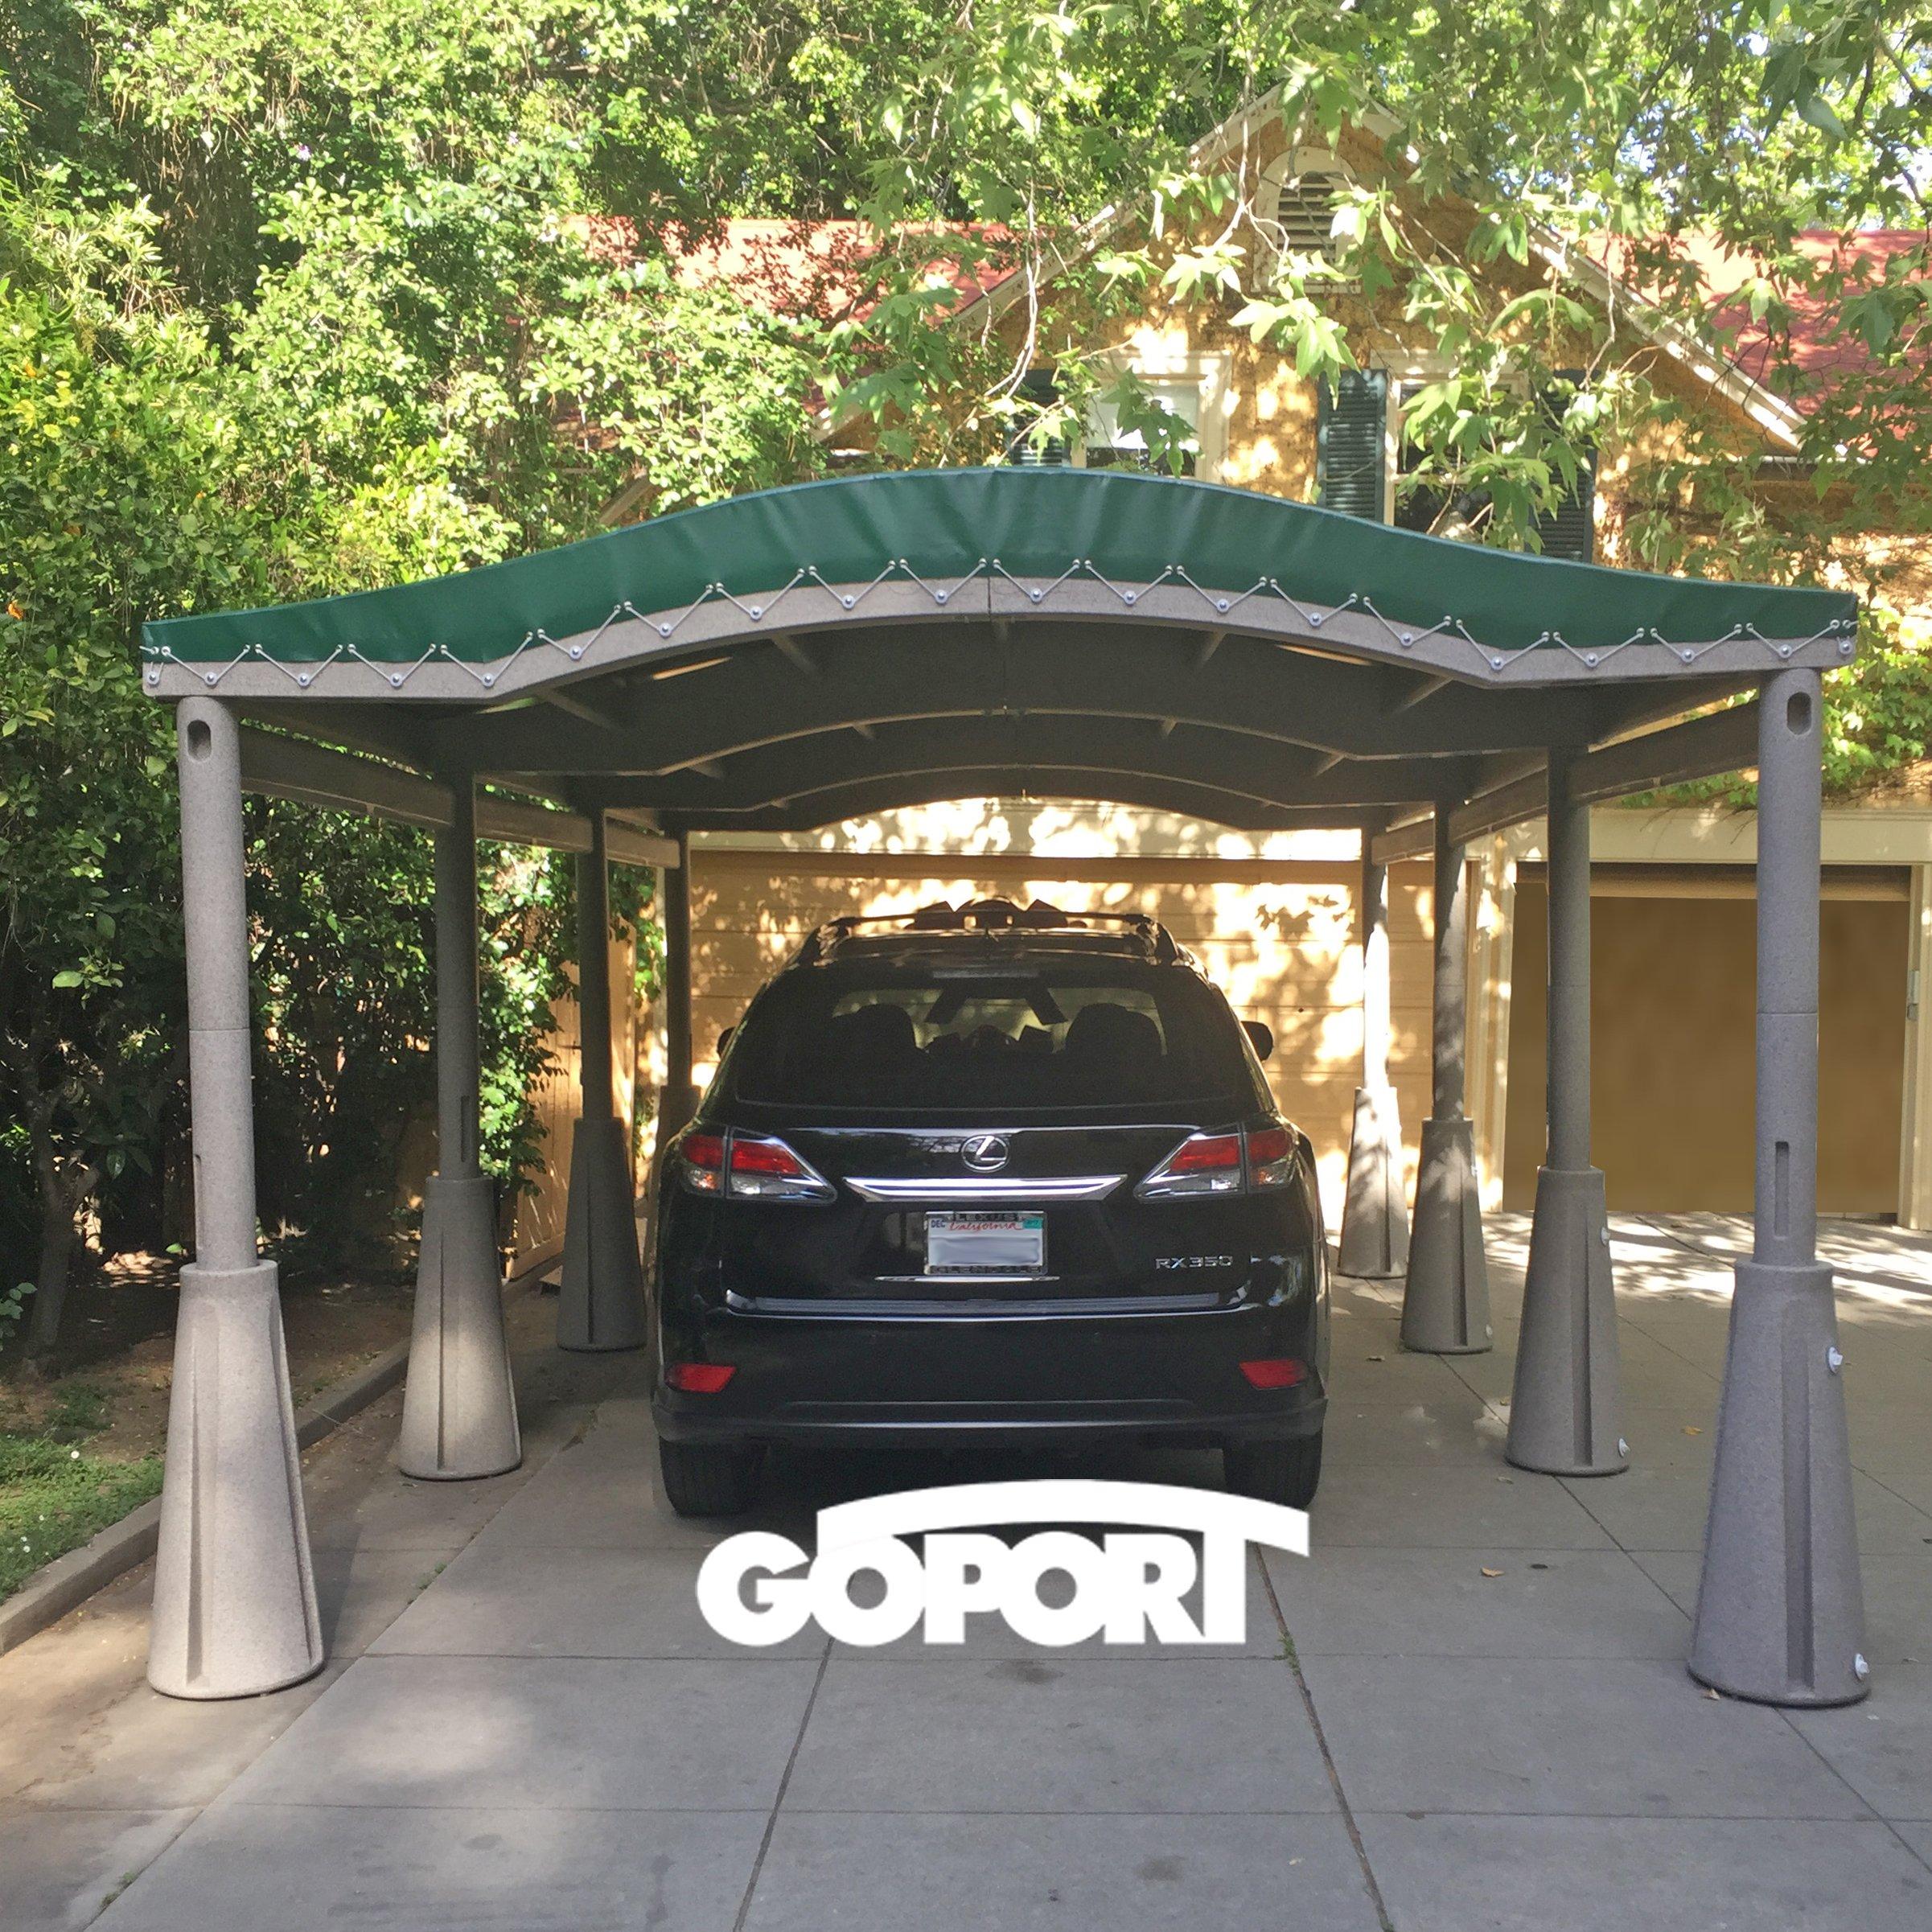 GoPort Portable Carport - Outdoor Shelter